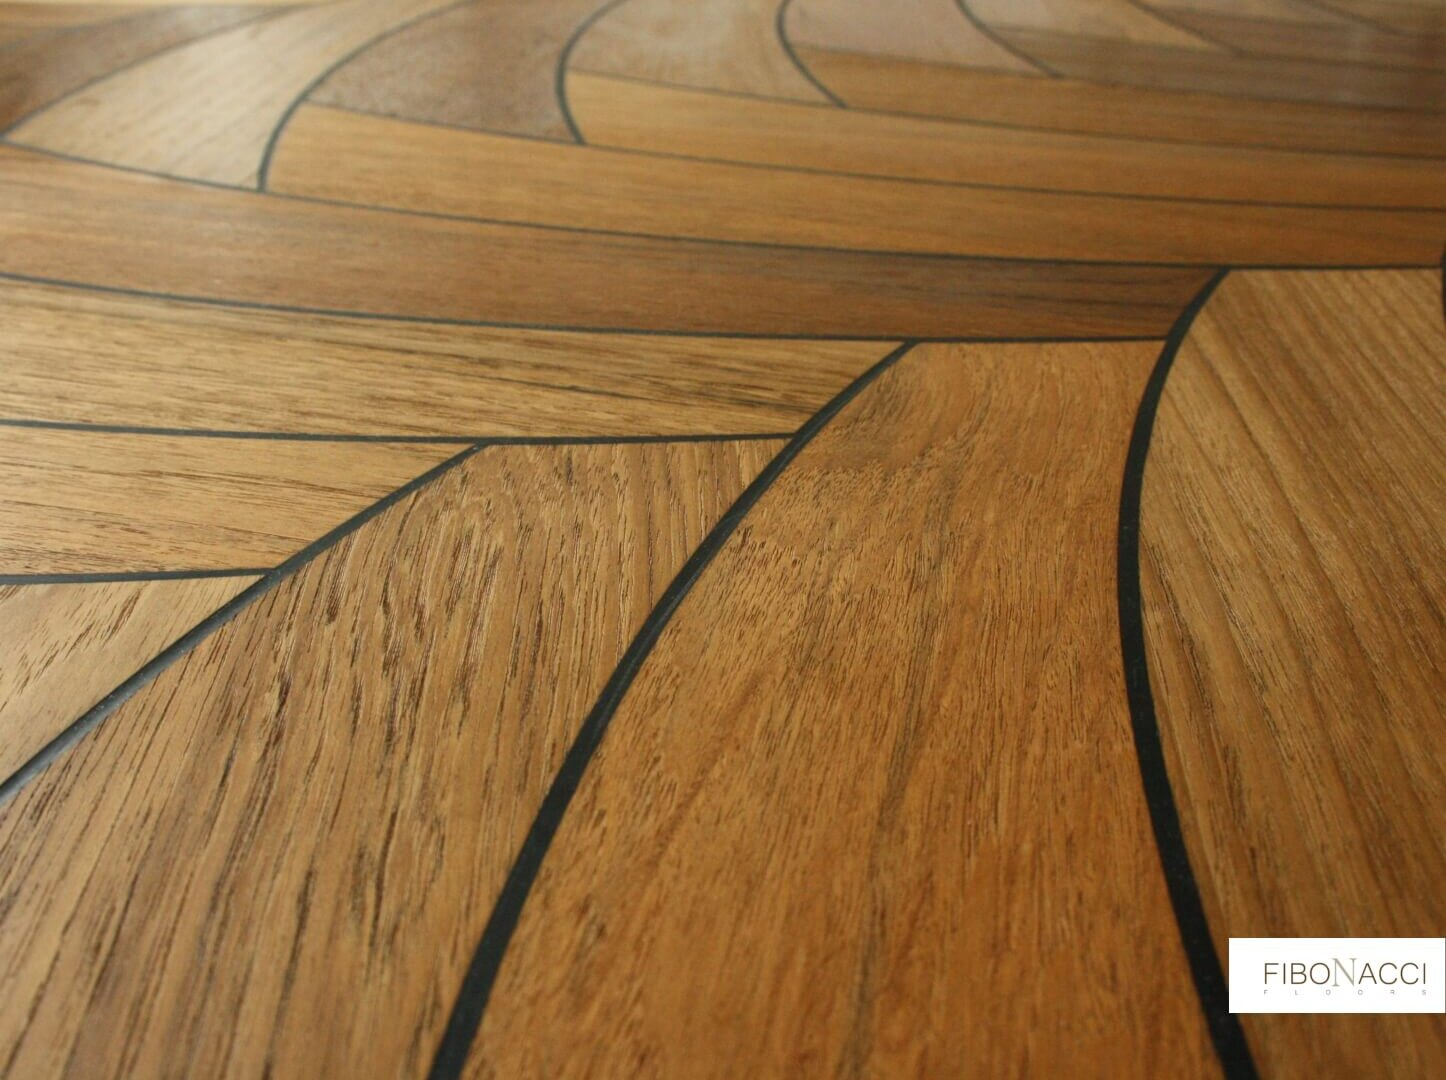 Angolo d'oro teak diepte - logo 51 cm br 72 dp1